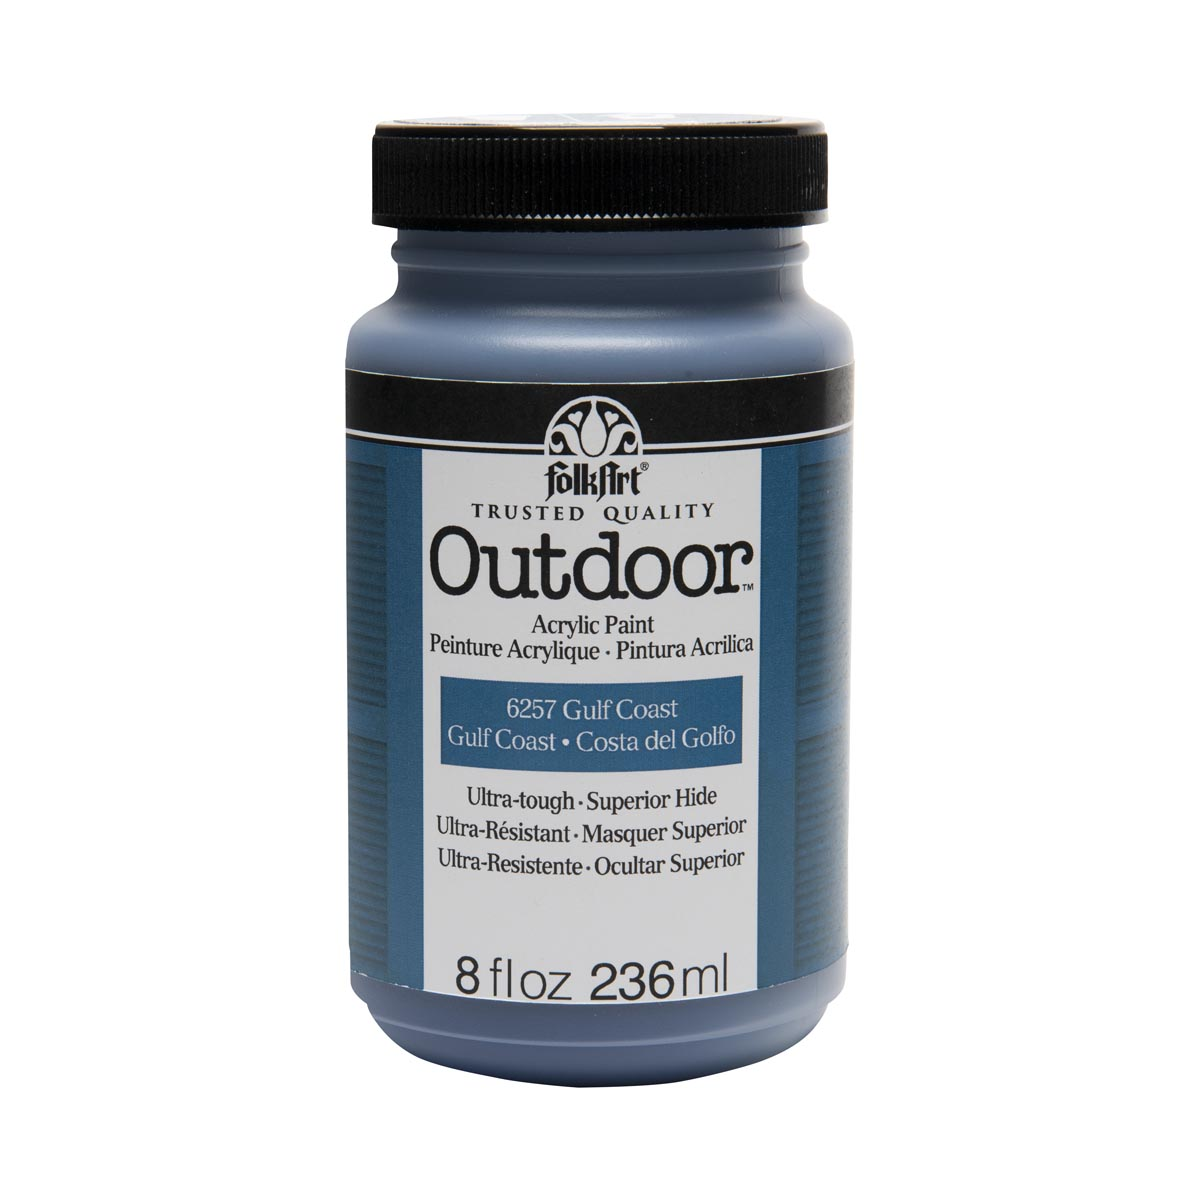 FolkArt ® Outdoor™ Acrylic Colors - Gulf Coast, 8 oz. - 6257